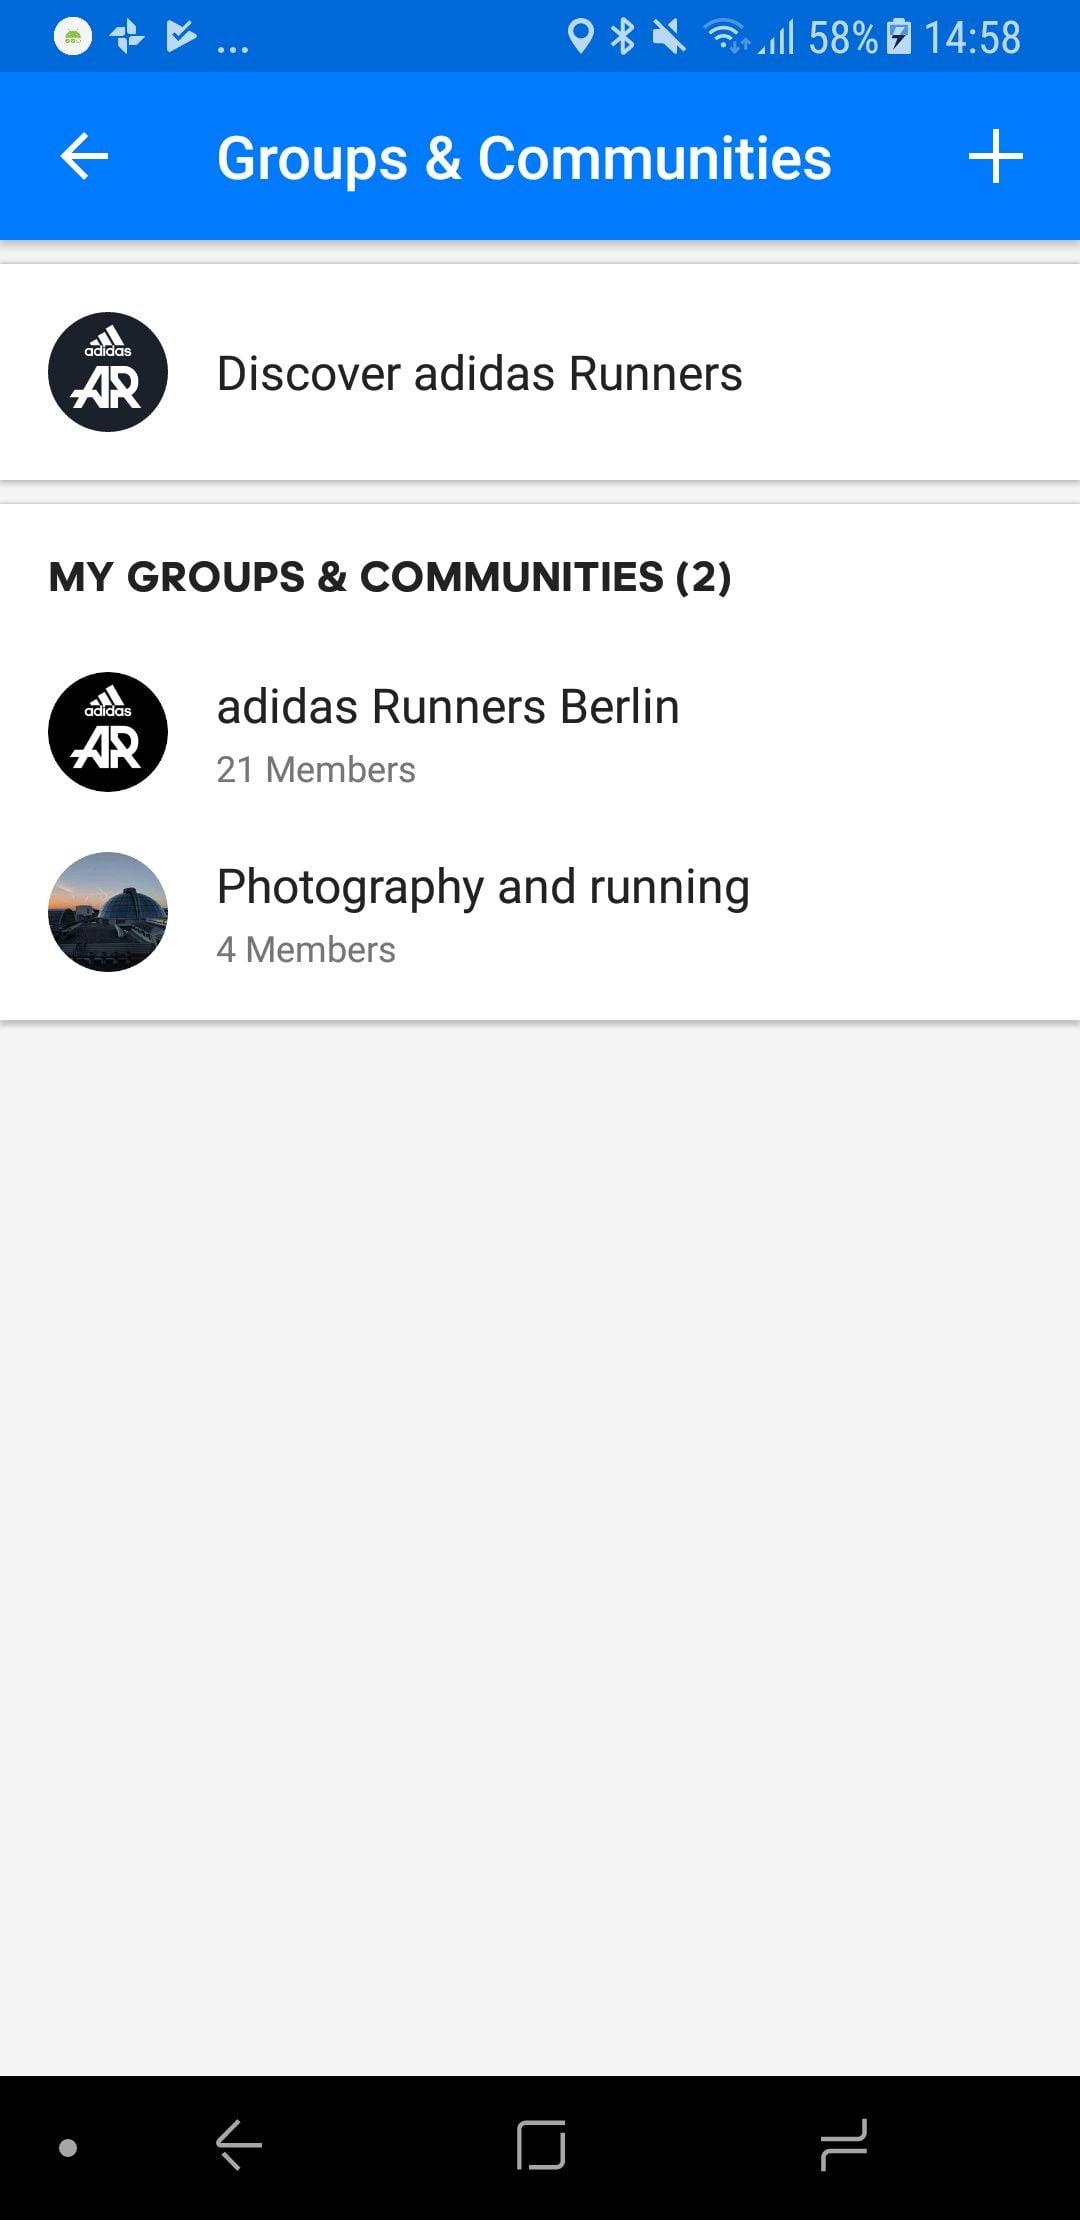 adidas Runners in Runtastic App groups